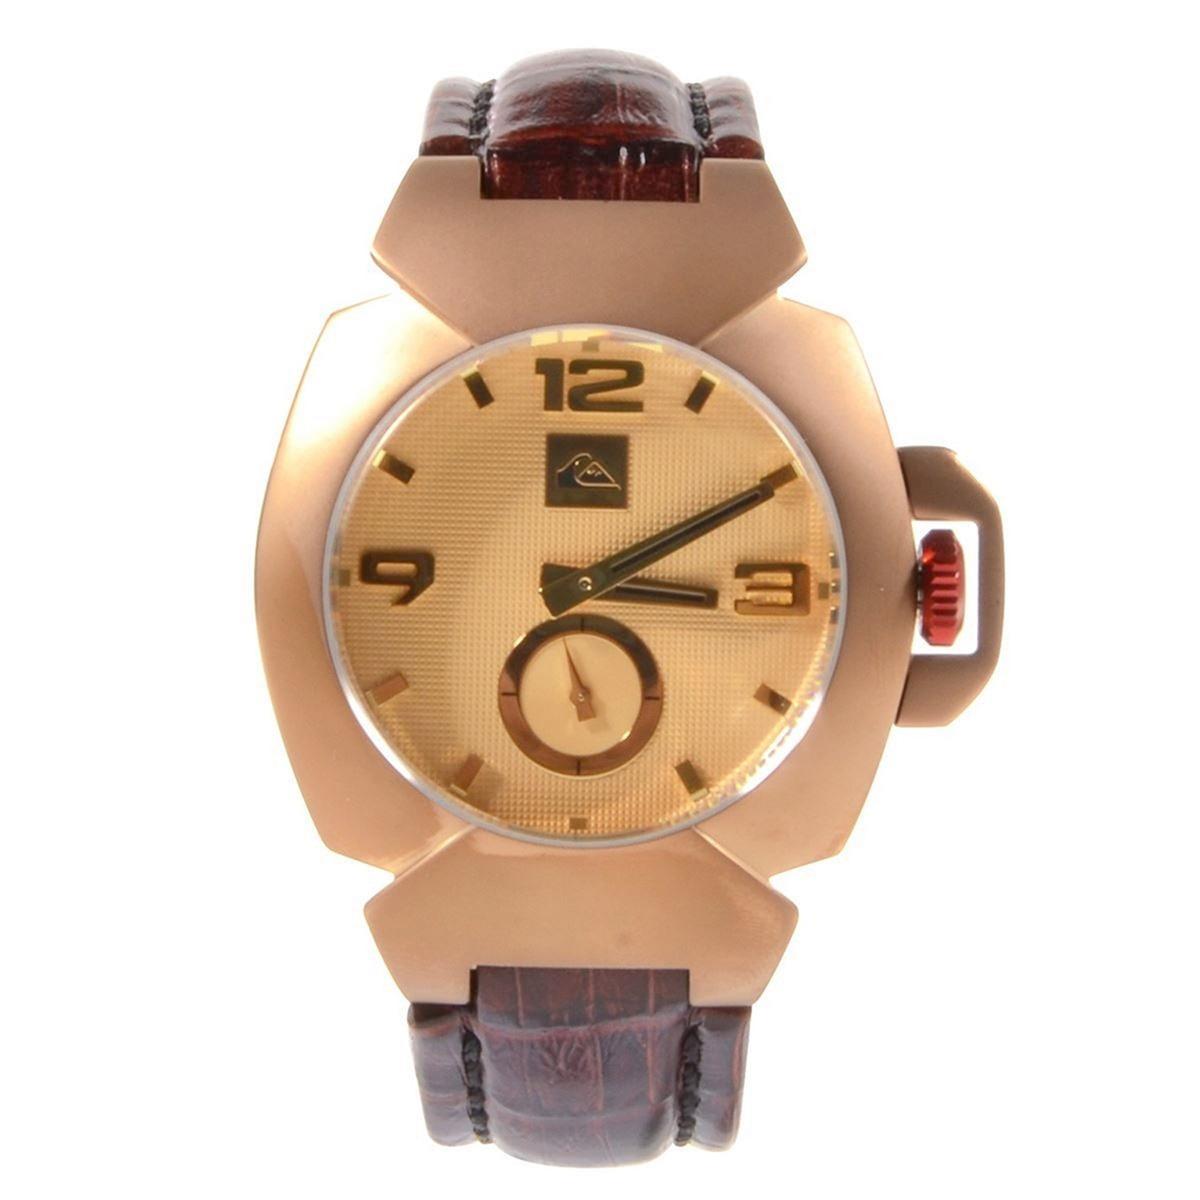 850c7de2f10 relógio quiksilver foxhound leather cooper dourado. Carregando zoom.